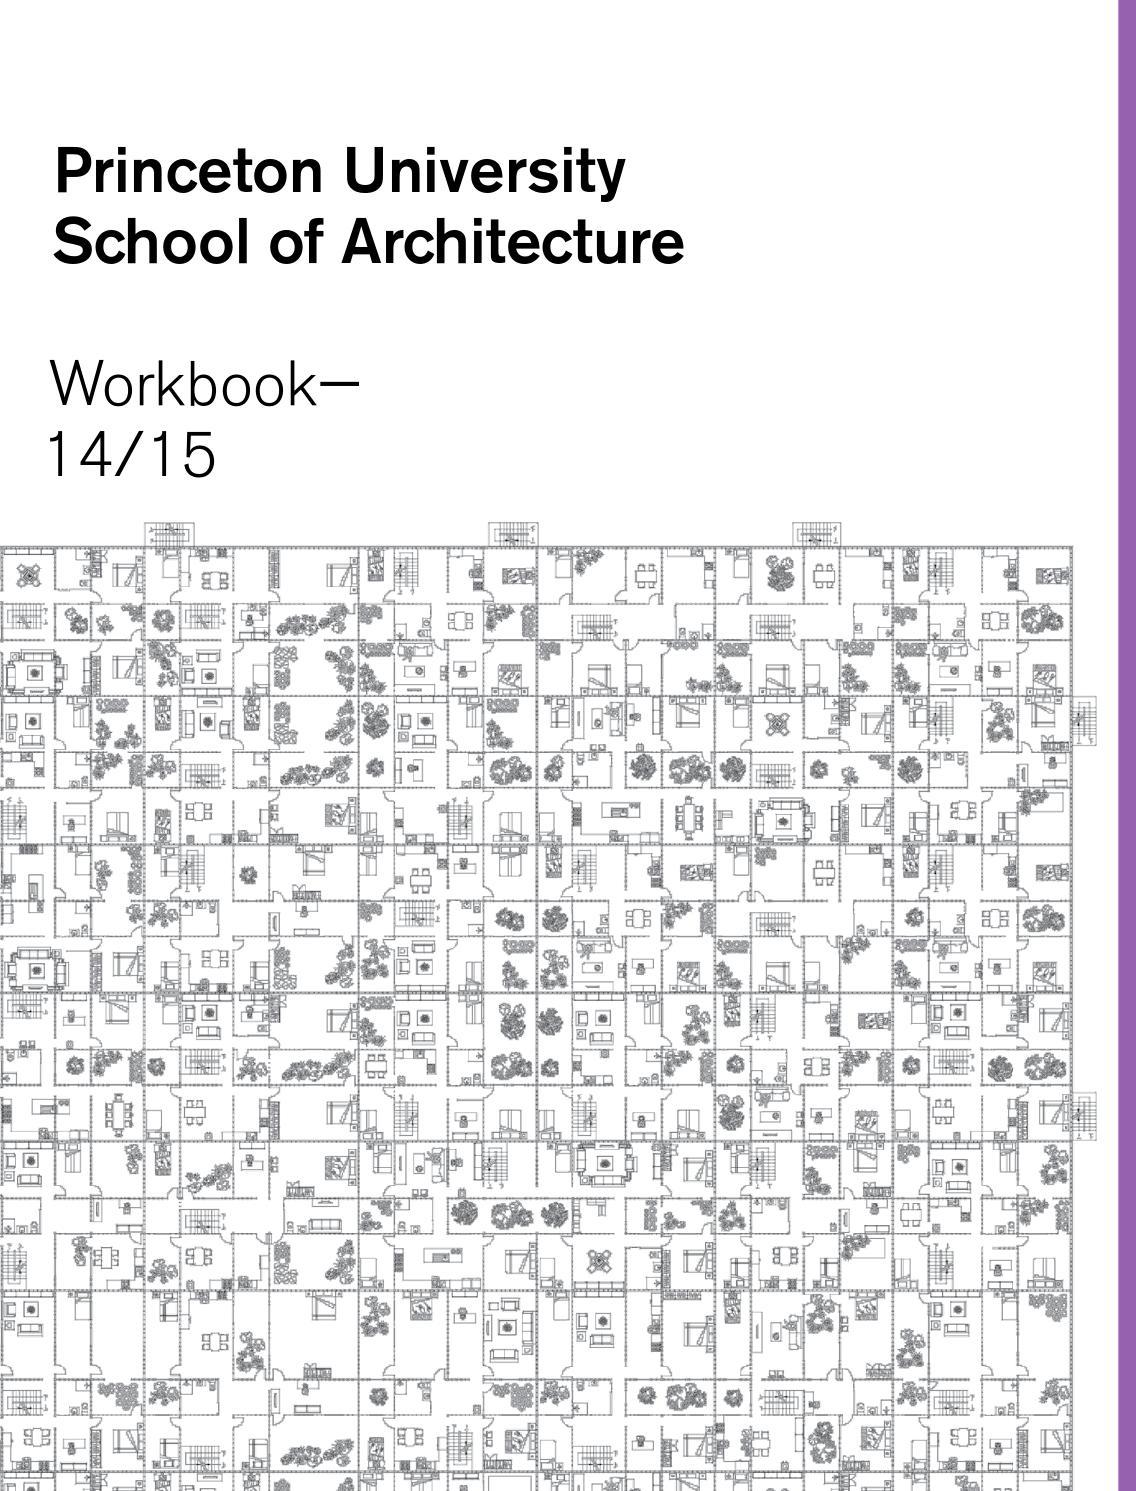 Workbooks relationship rescue workbook : Princeton University School of Architecture Workbook 14/15 by ...